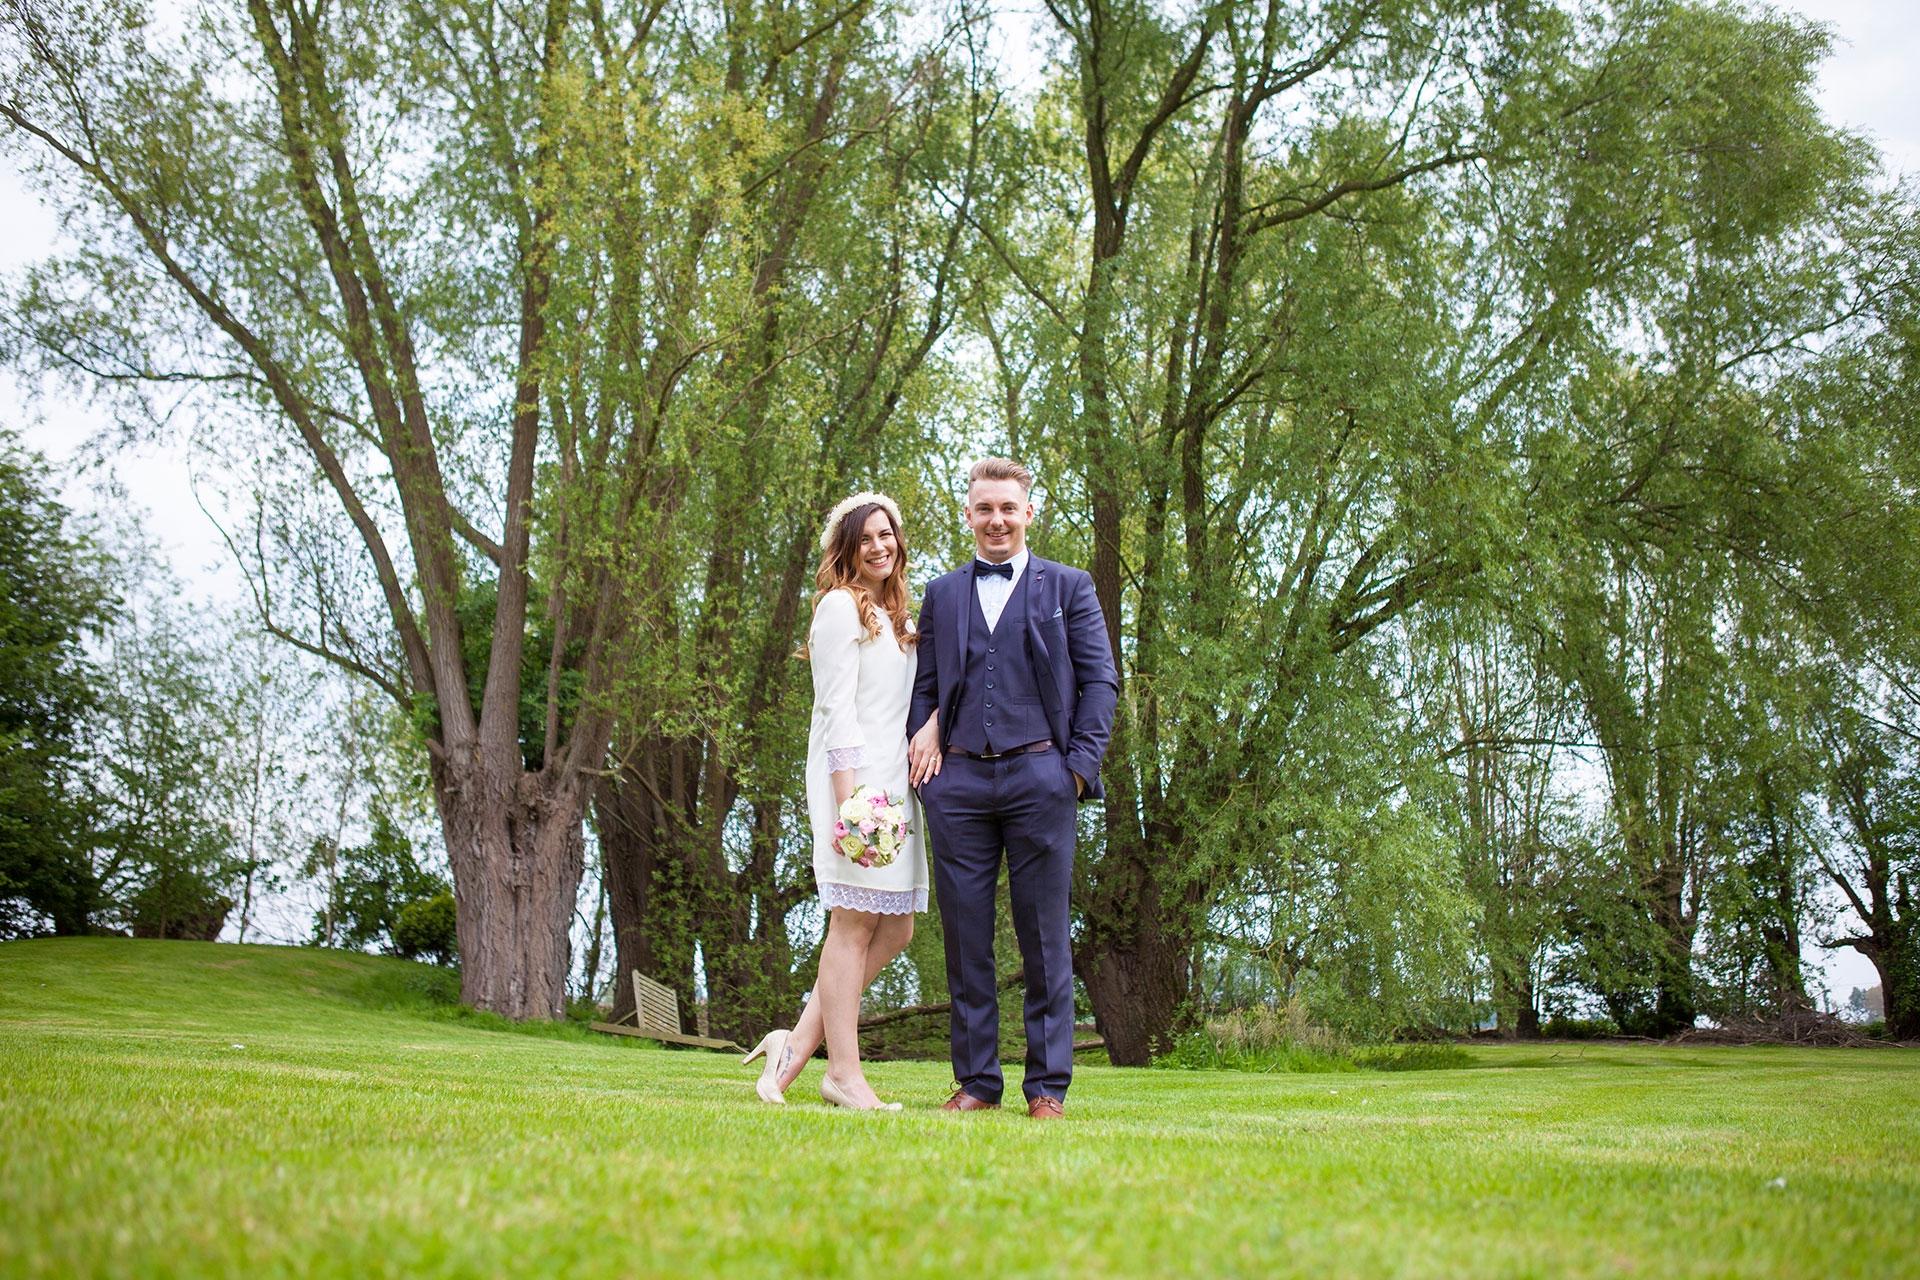 particuliers-evenements-mariages-oui-zelie&valentin-22